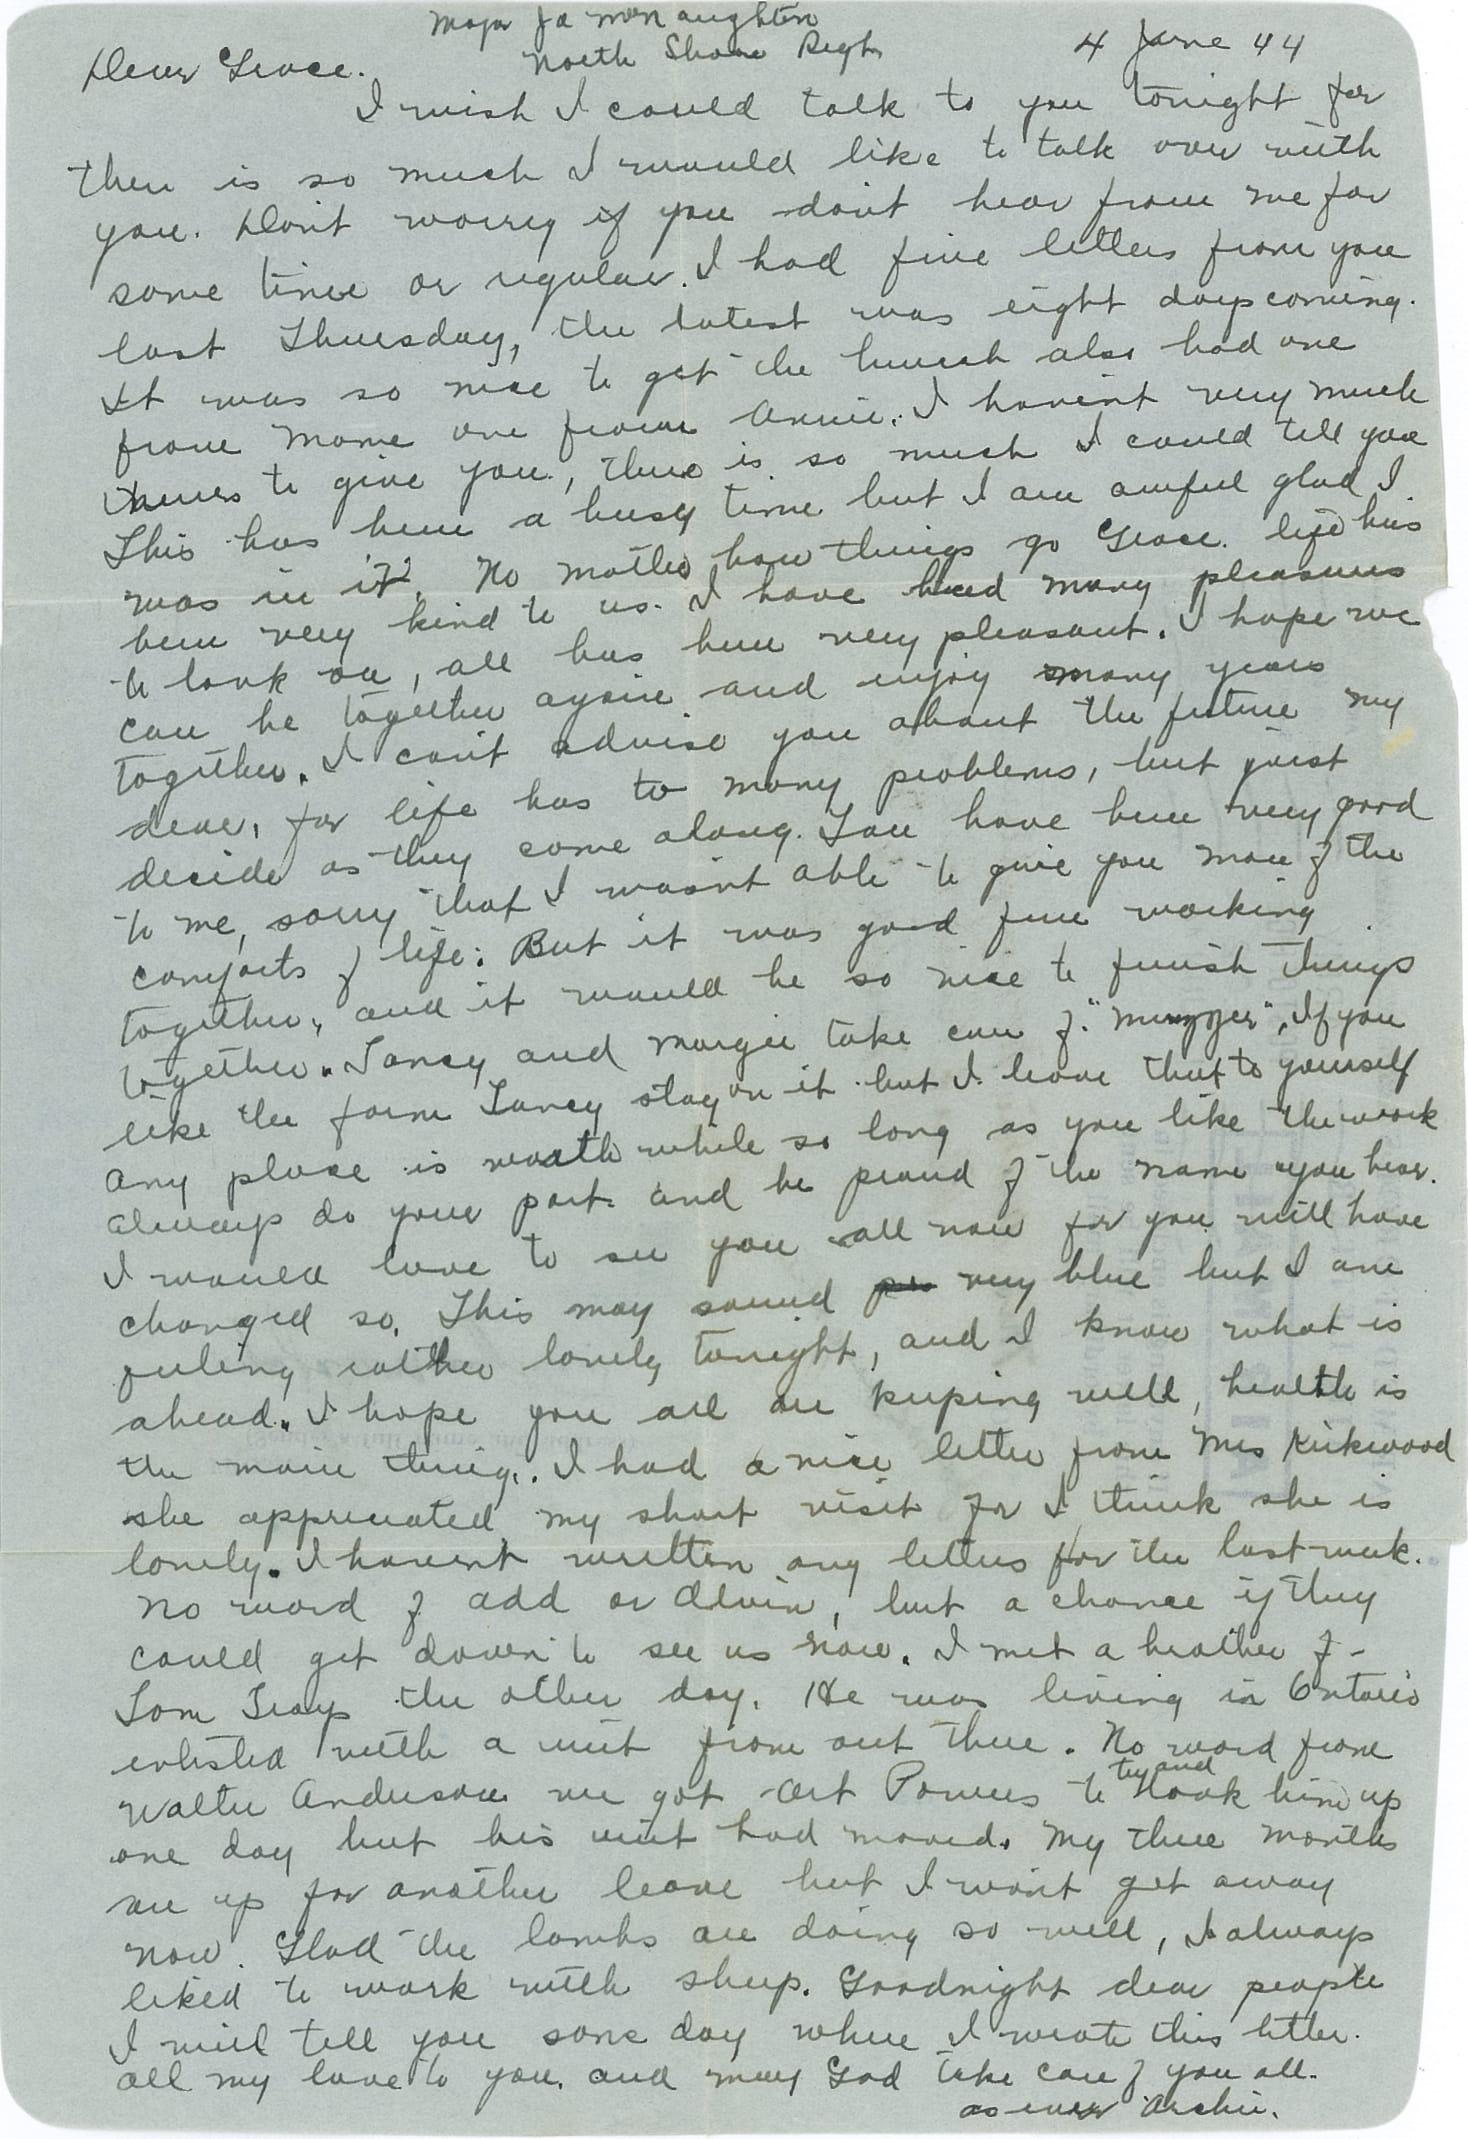 Archie MacNaughton's letter